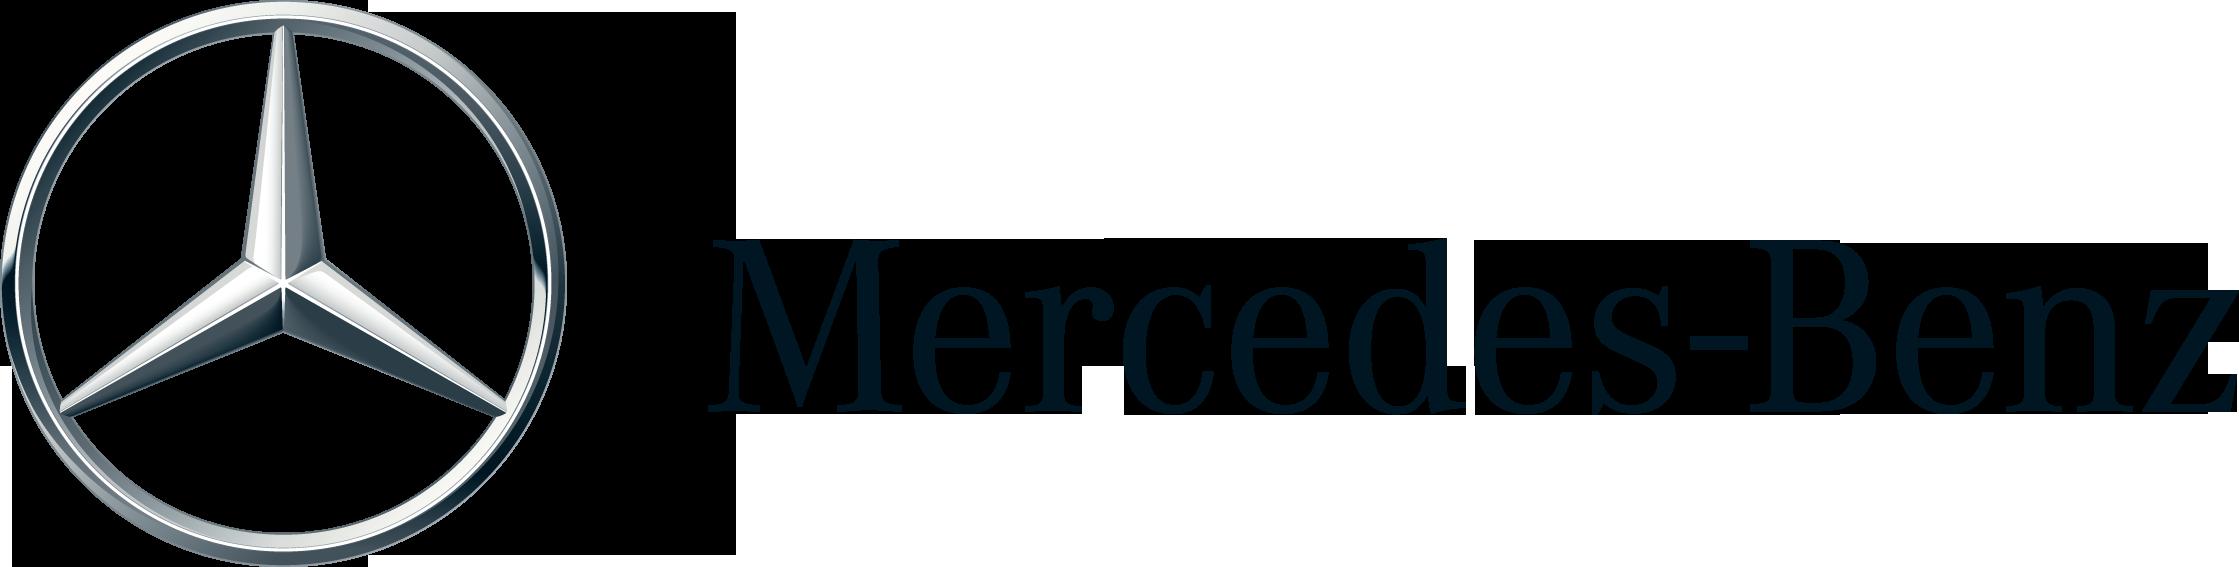 Mercedes Benz India Introduces Luxefest A Celebration